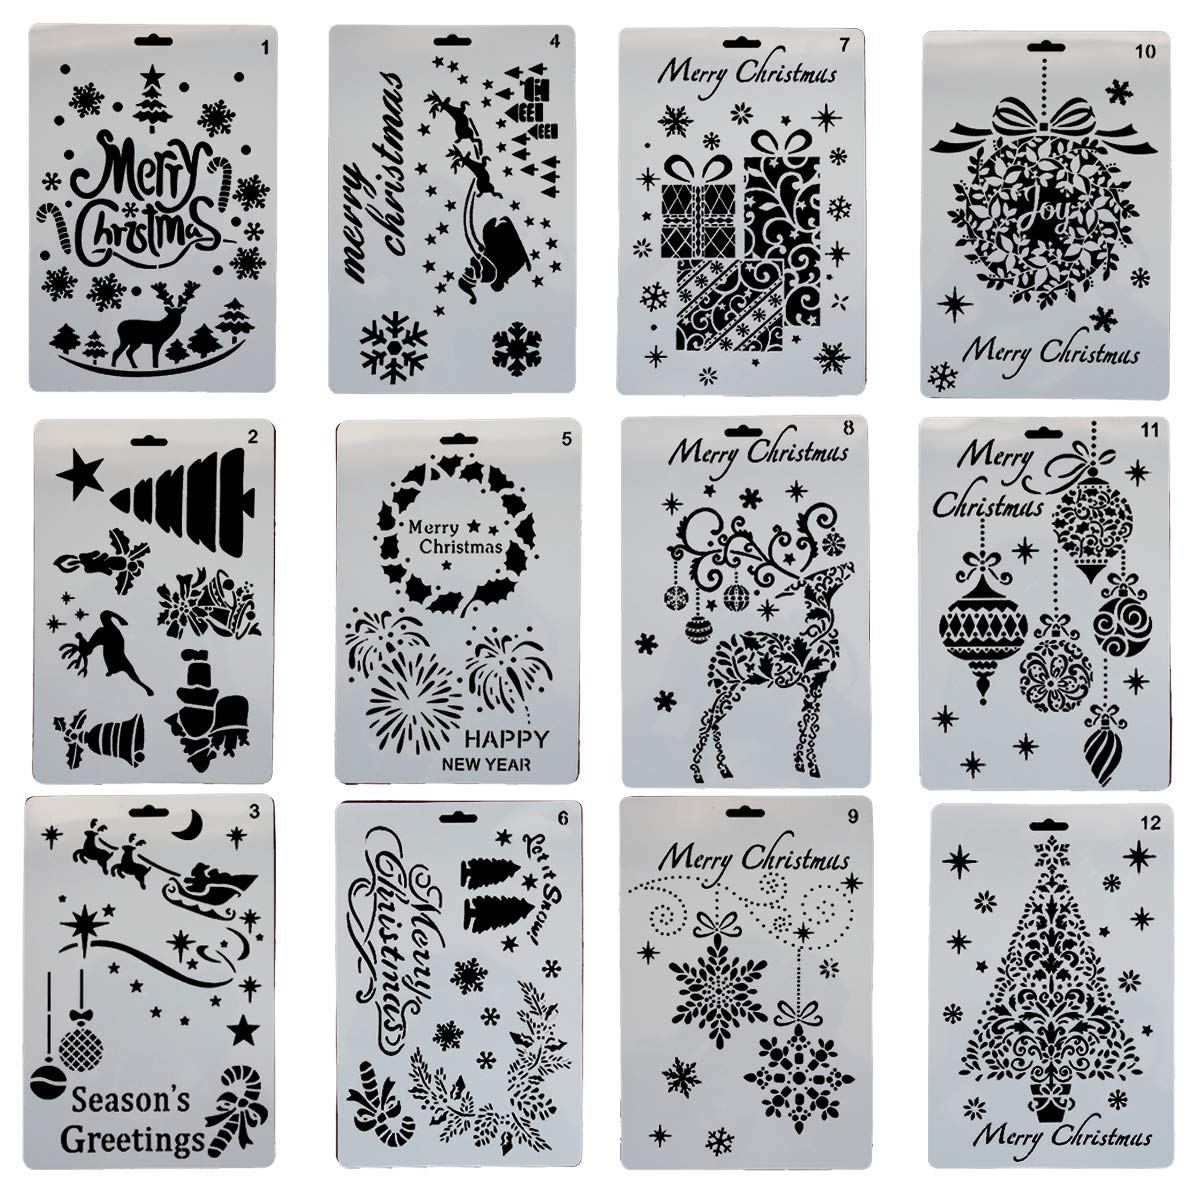 Gnognauq 12 Pack 25cm 18cm Christmas Stencils Template Plastic Painting Stencil for DIY Crafts Project   B07JP9TKYS